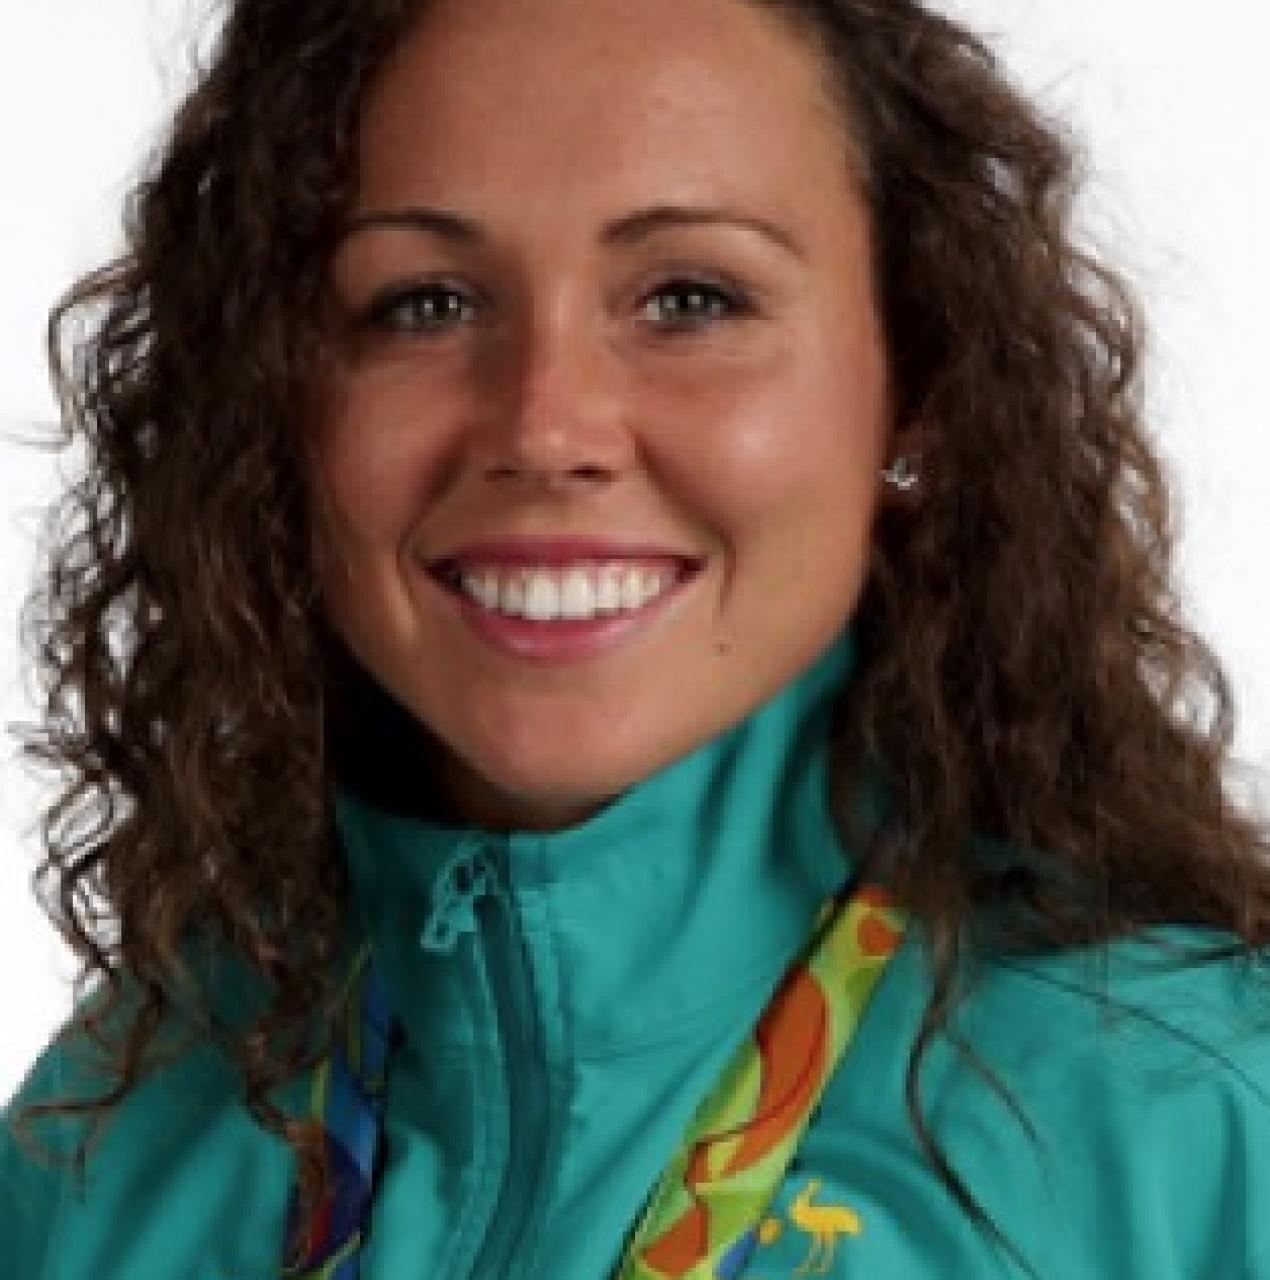 Chloe Esposito